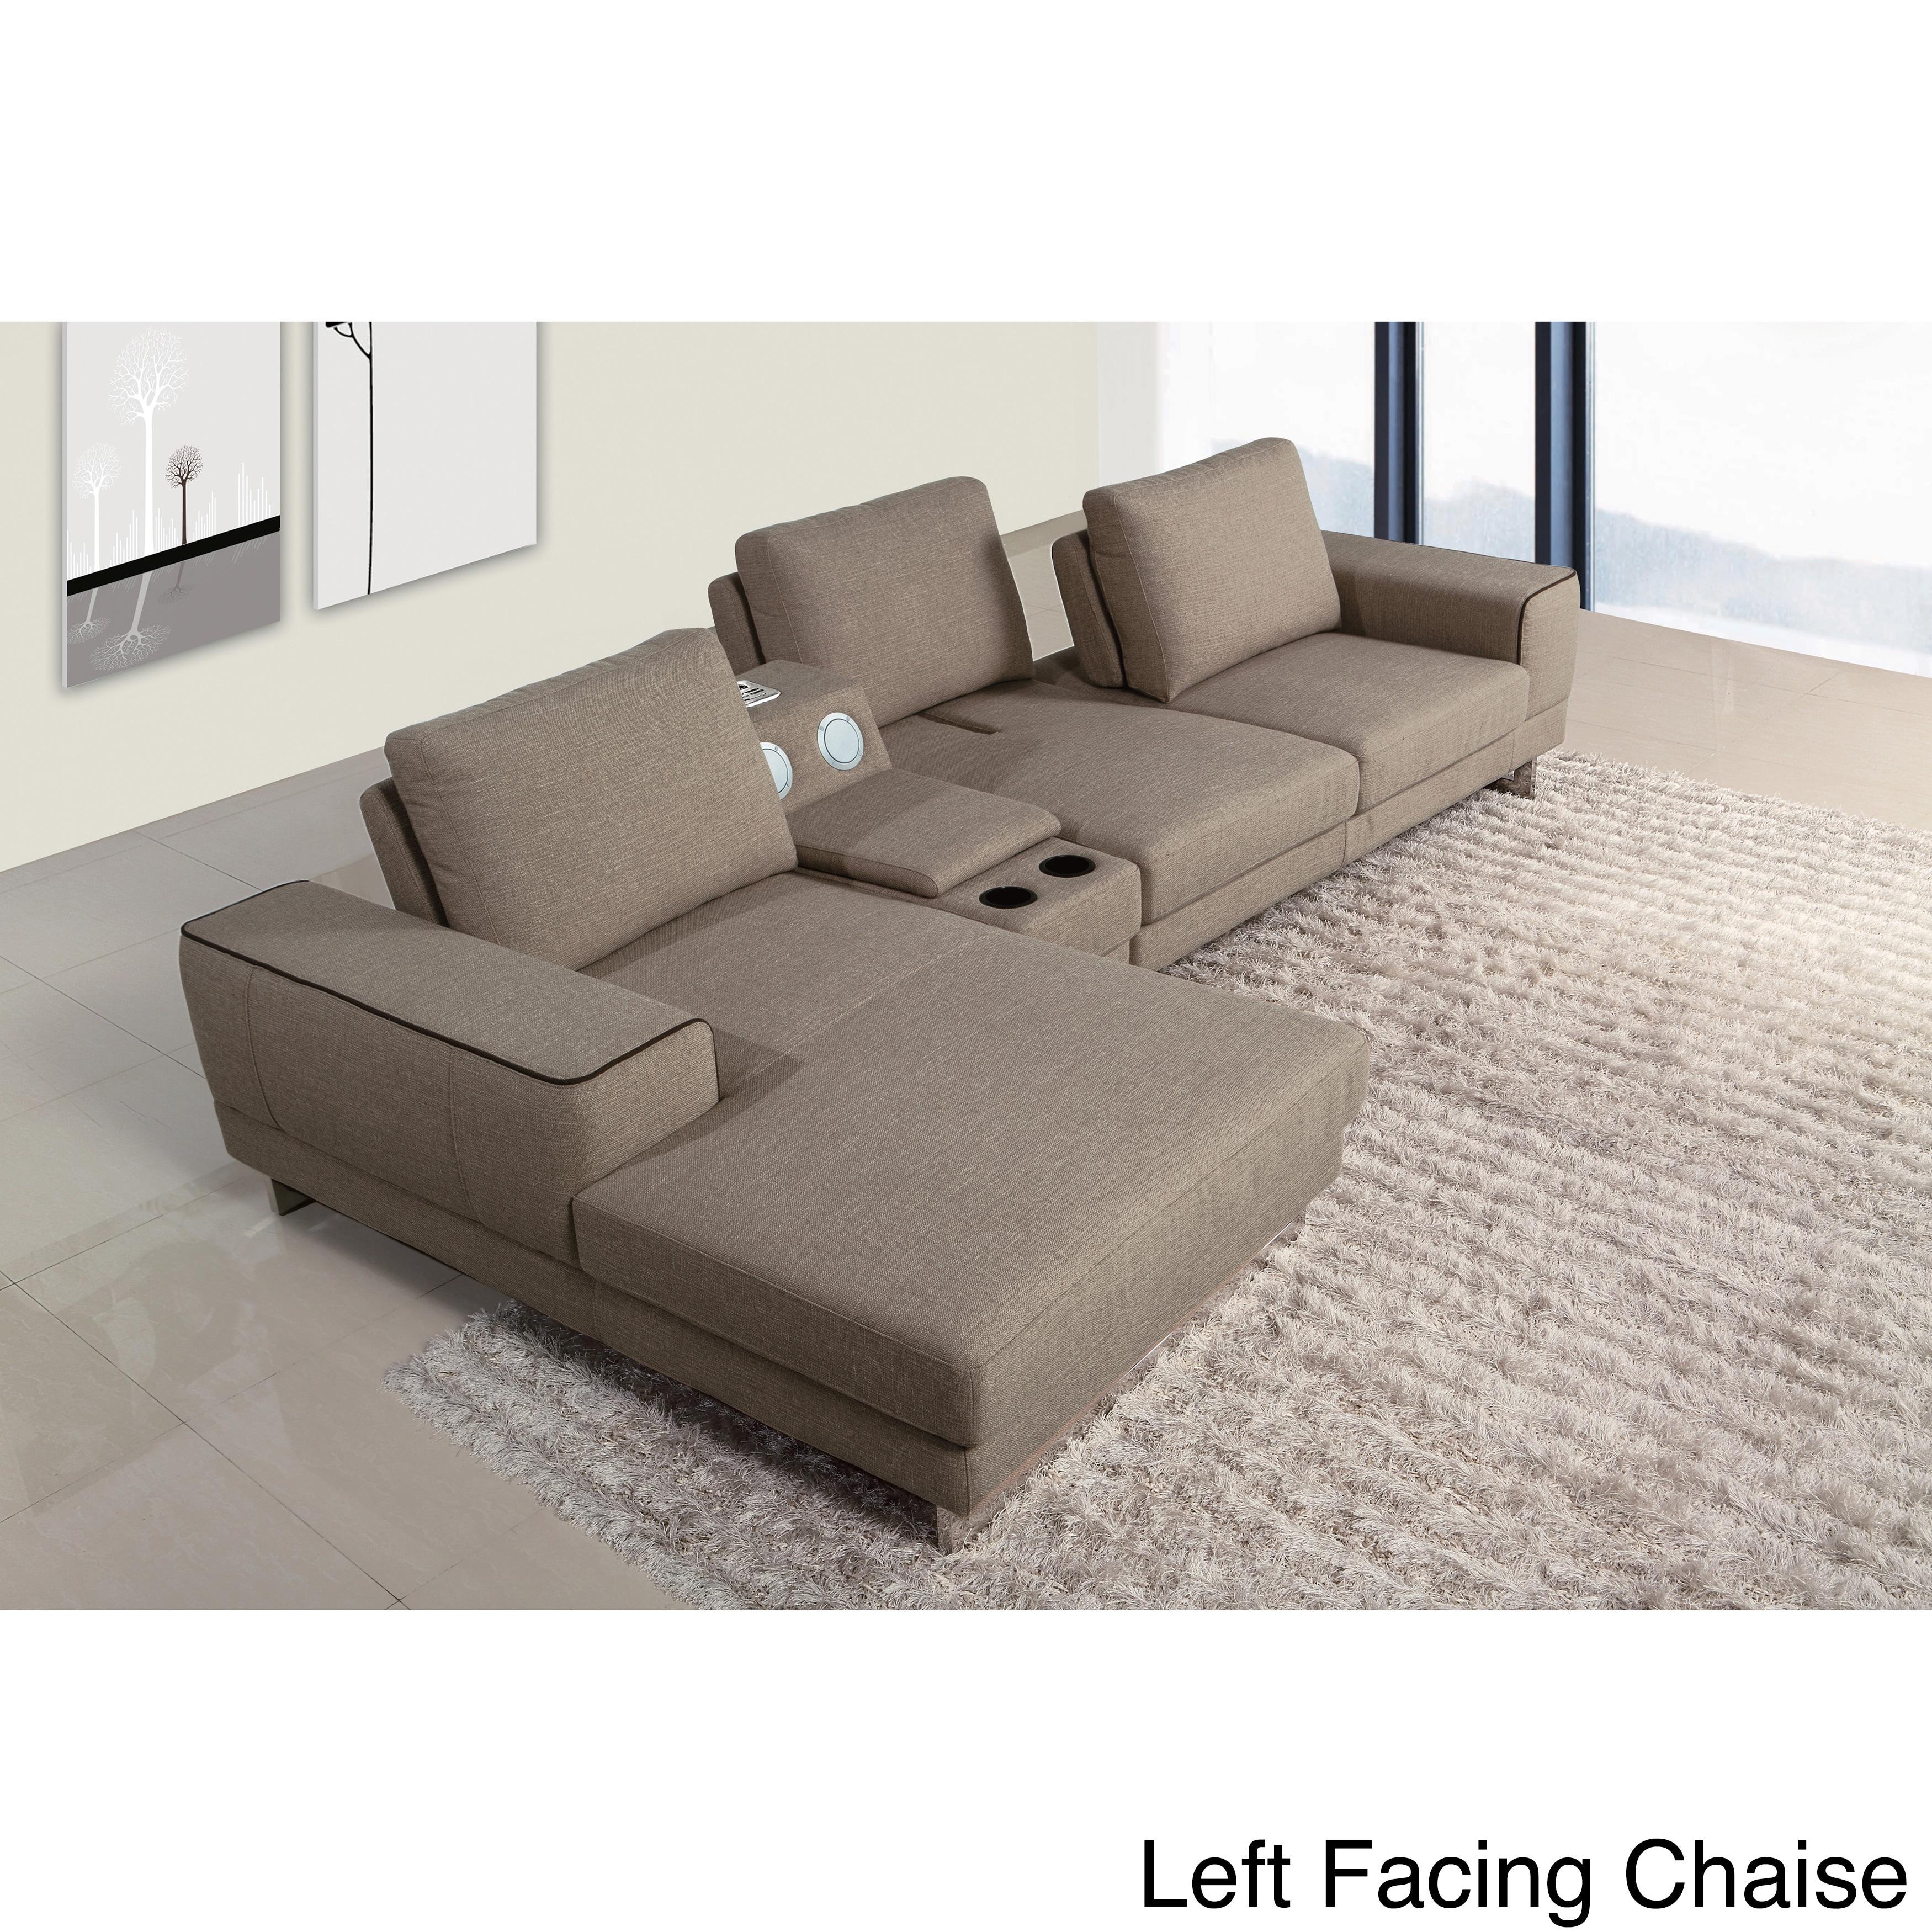 Dg casa berkeley sectional sofa